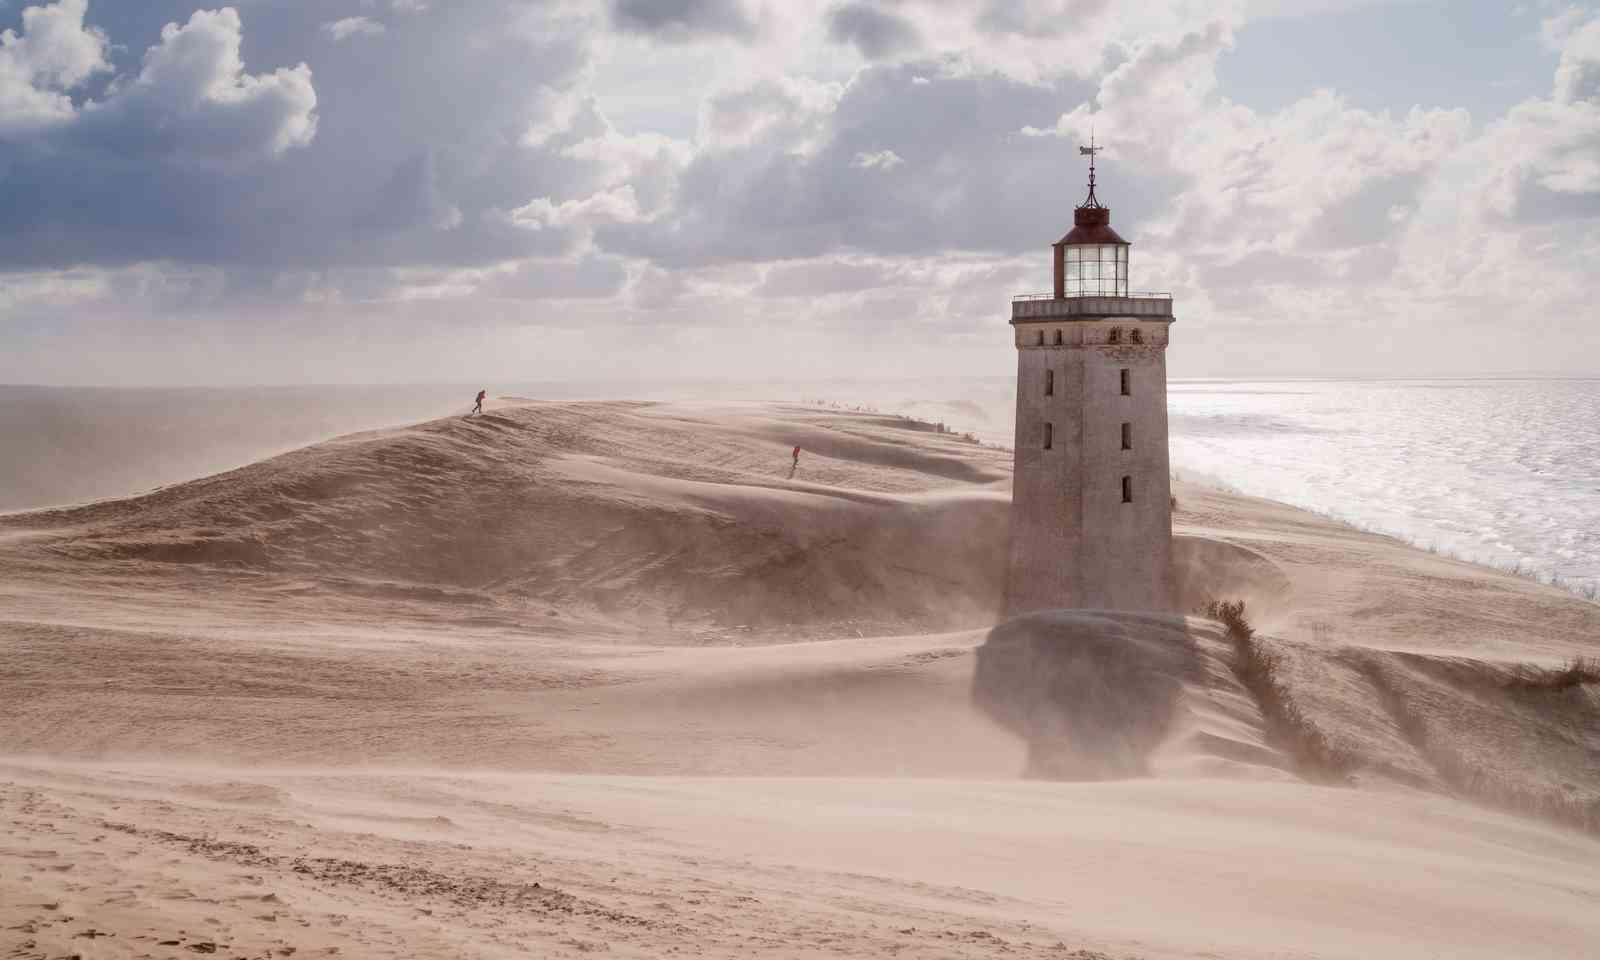 Sandstorm engulfs Rubjerg Knude Lighthouse (Dreamstime)